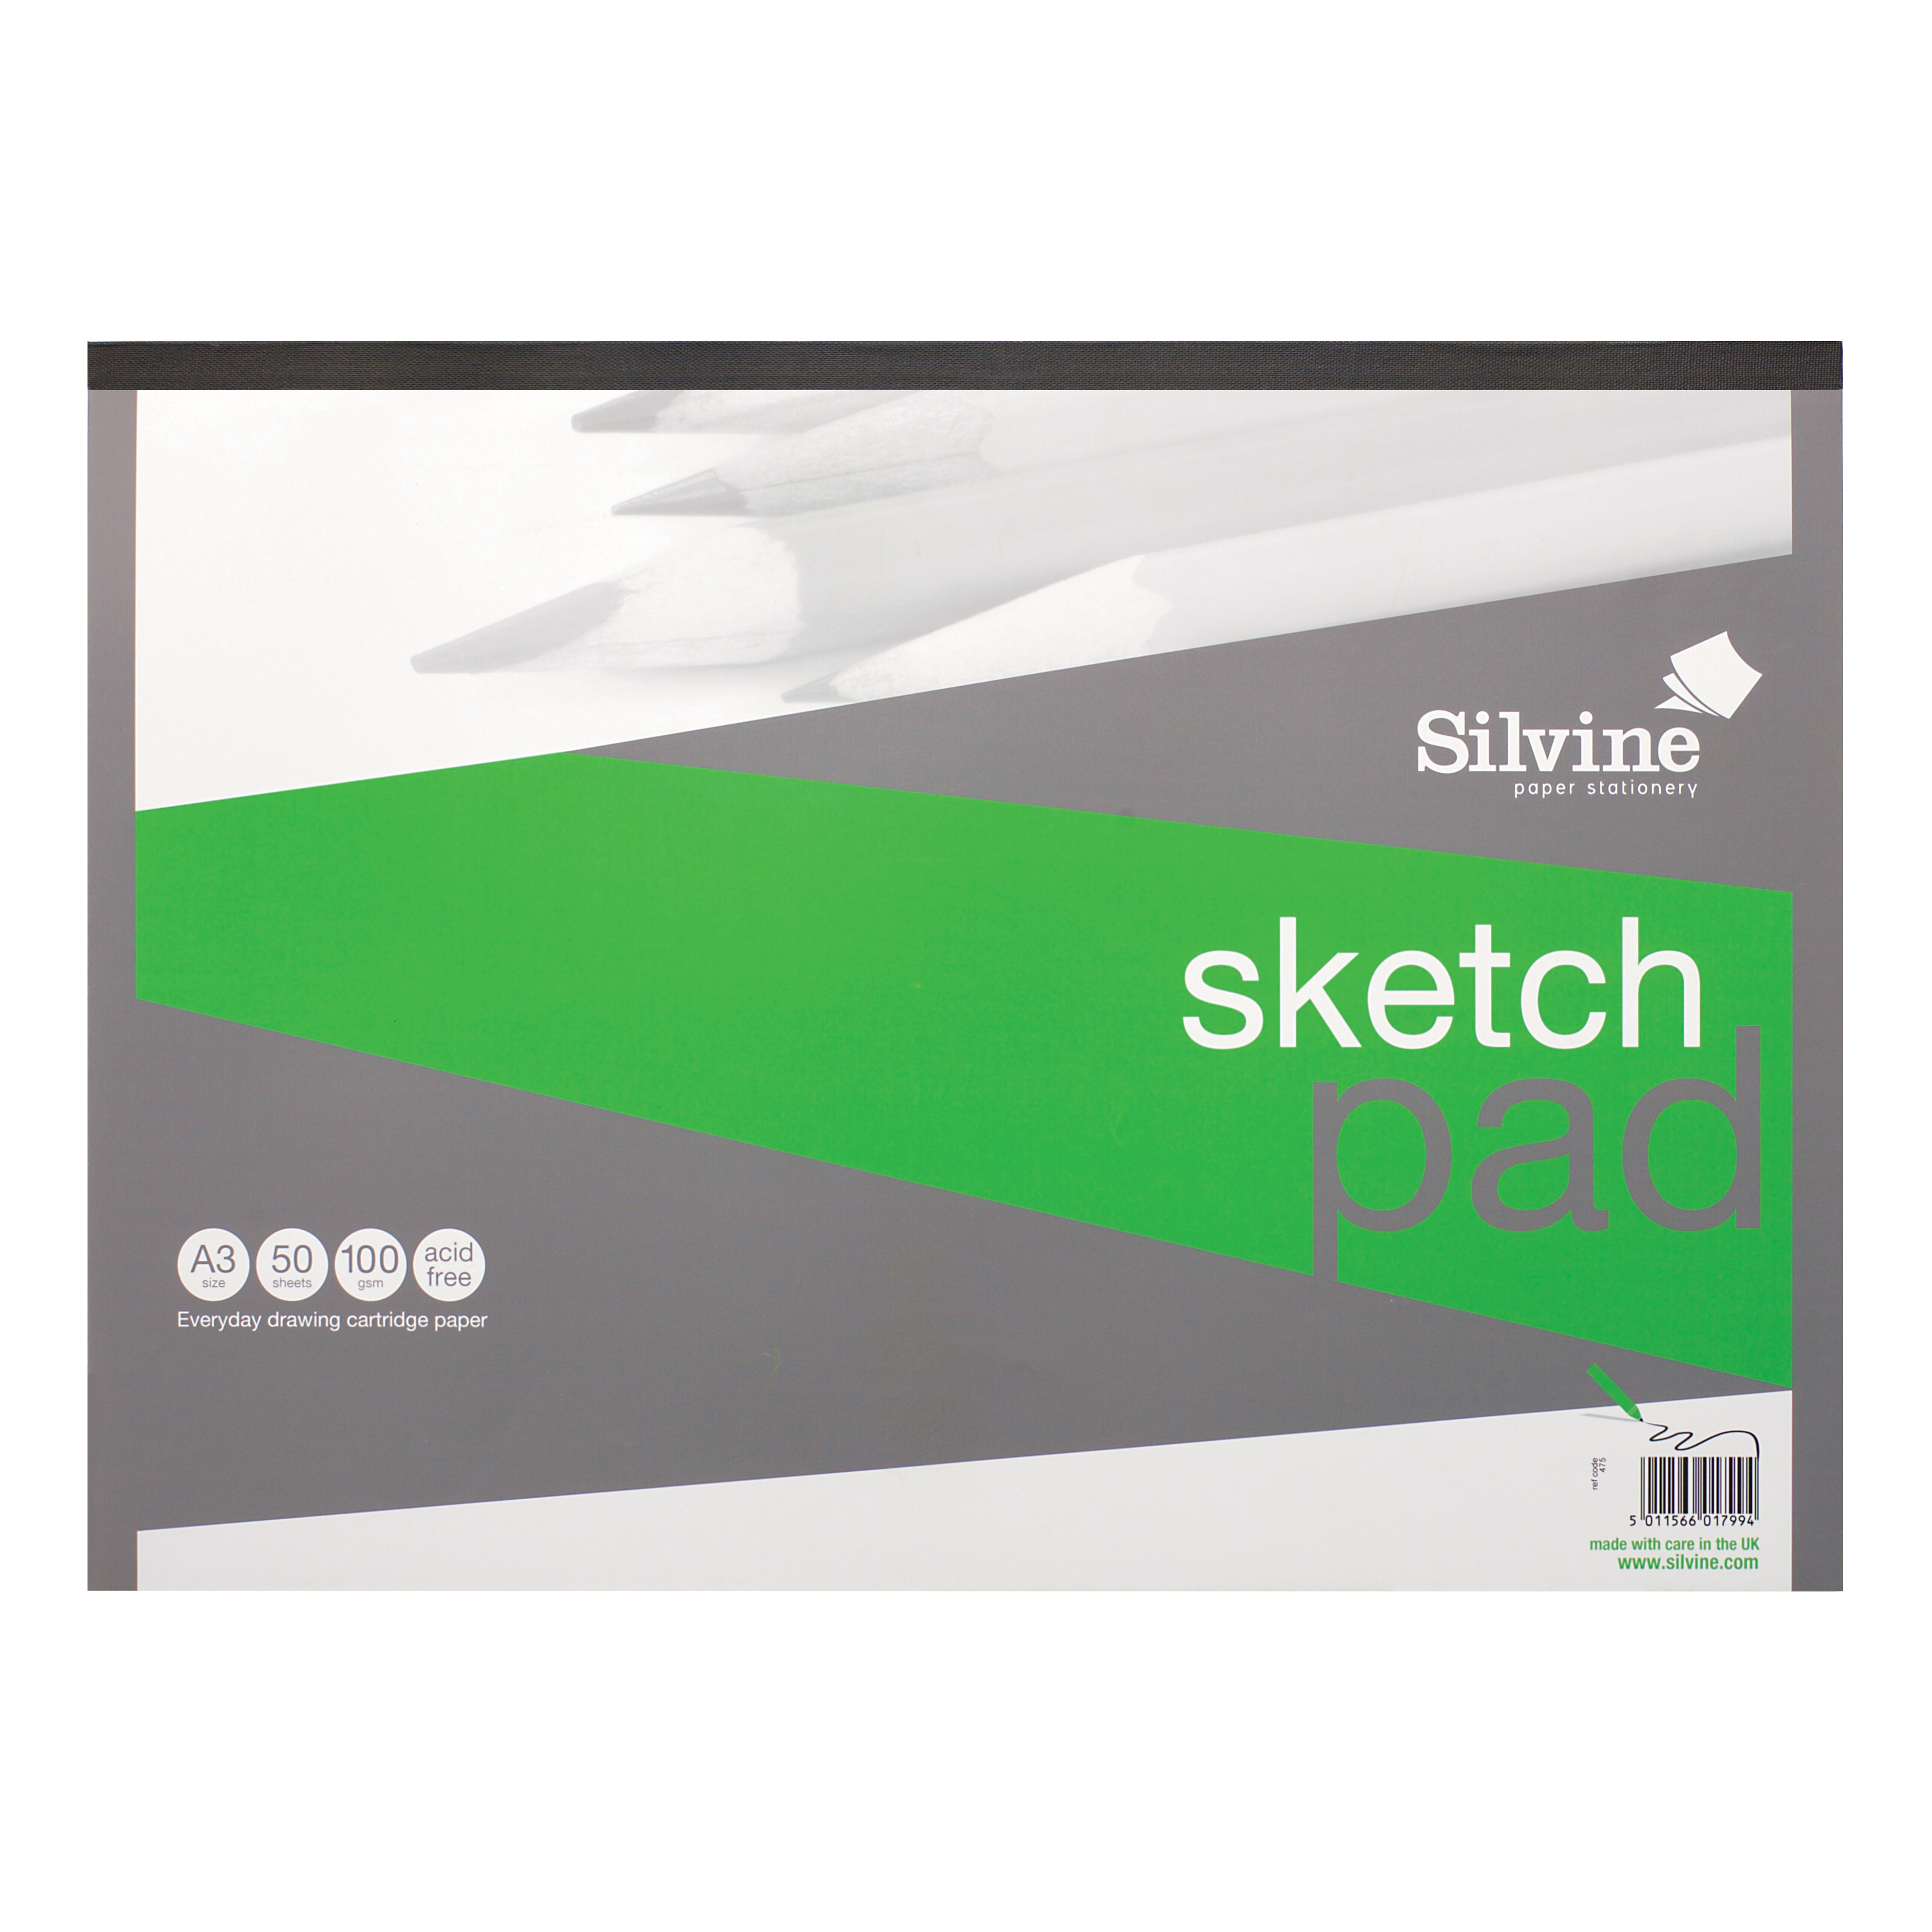 Silvine Popular Drawing Pad Acid Free Cartridge Paper 100gsm 50 Sheets A3